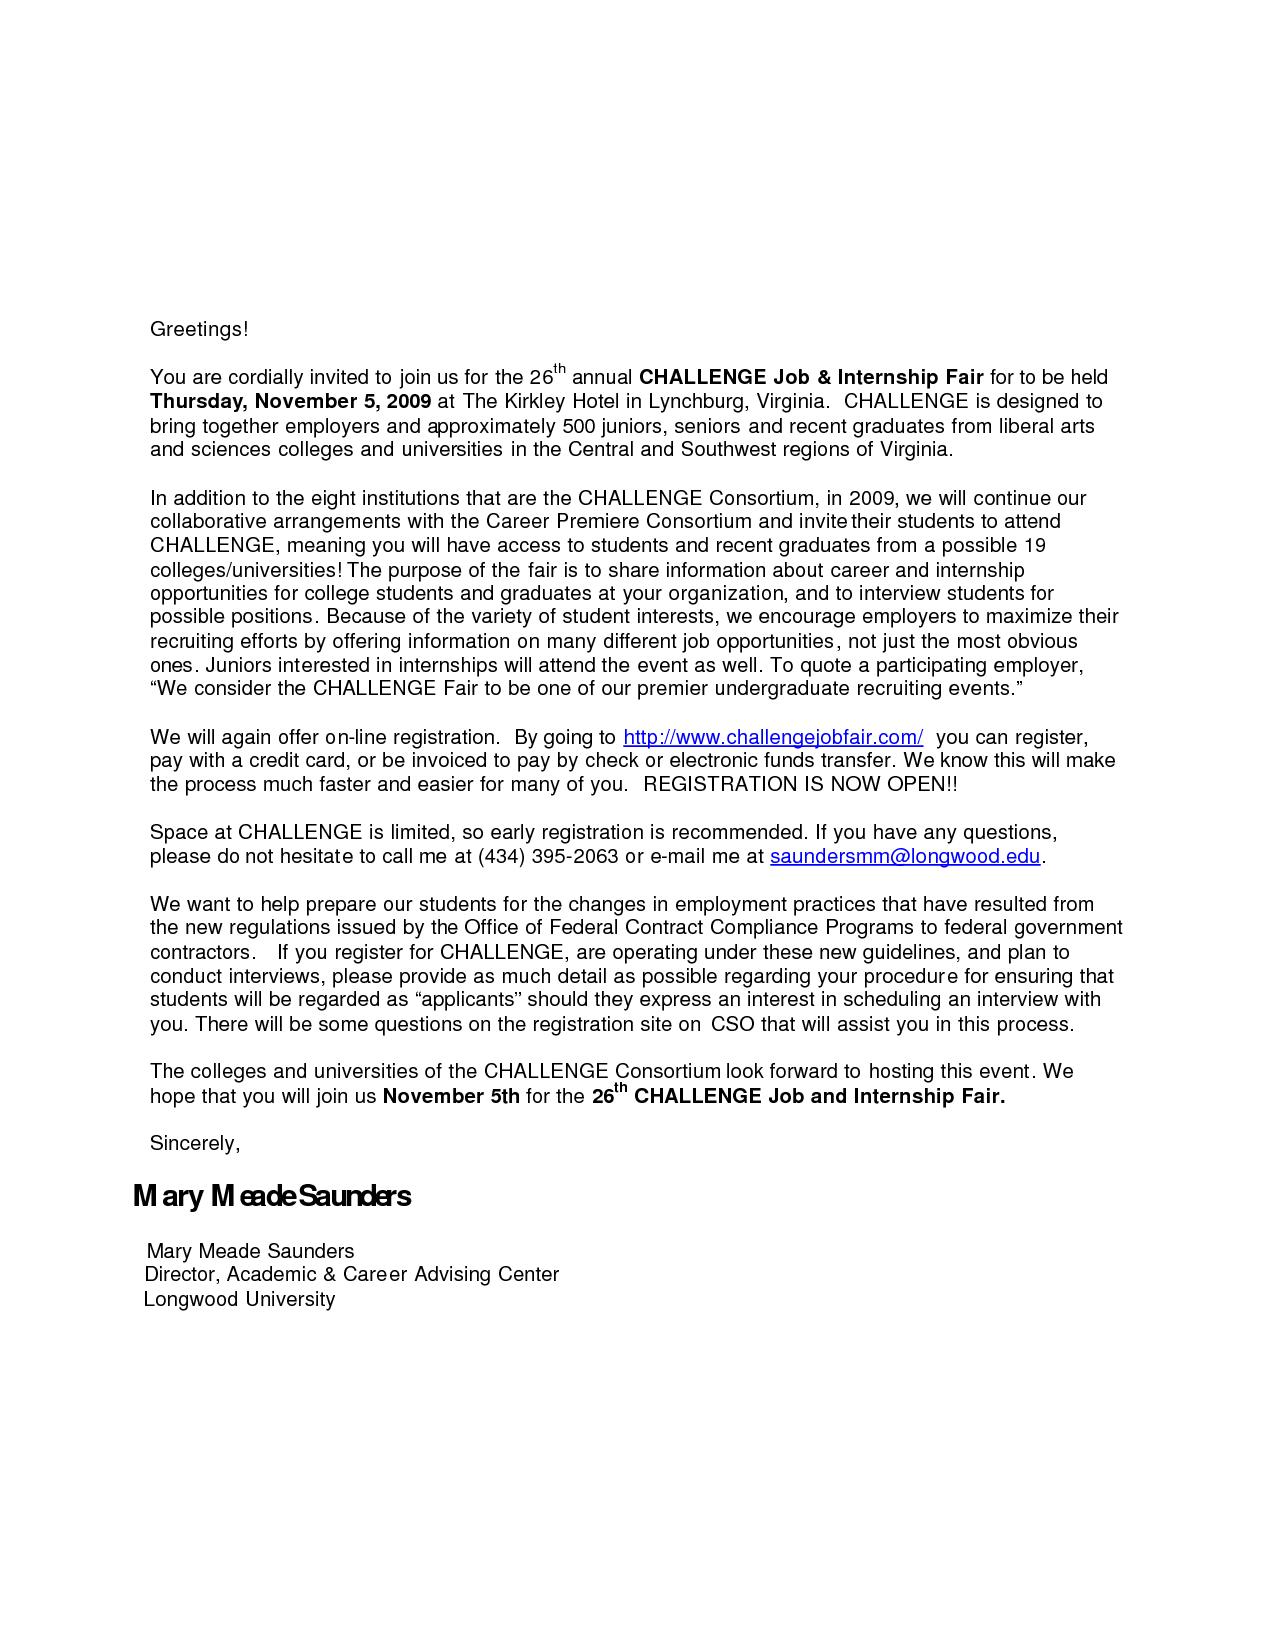 Sample Job Fair Invitation Letter